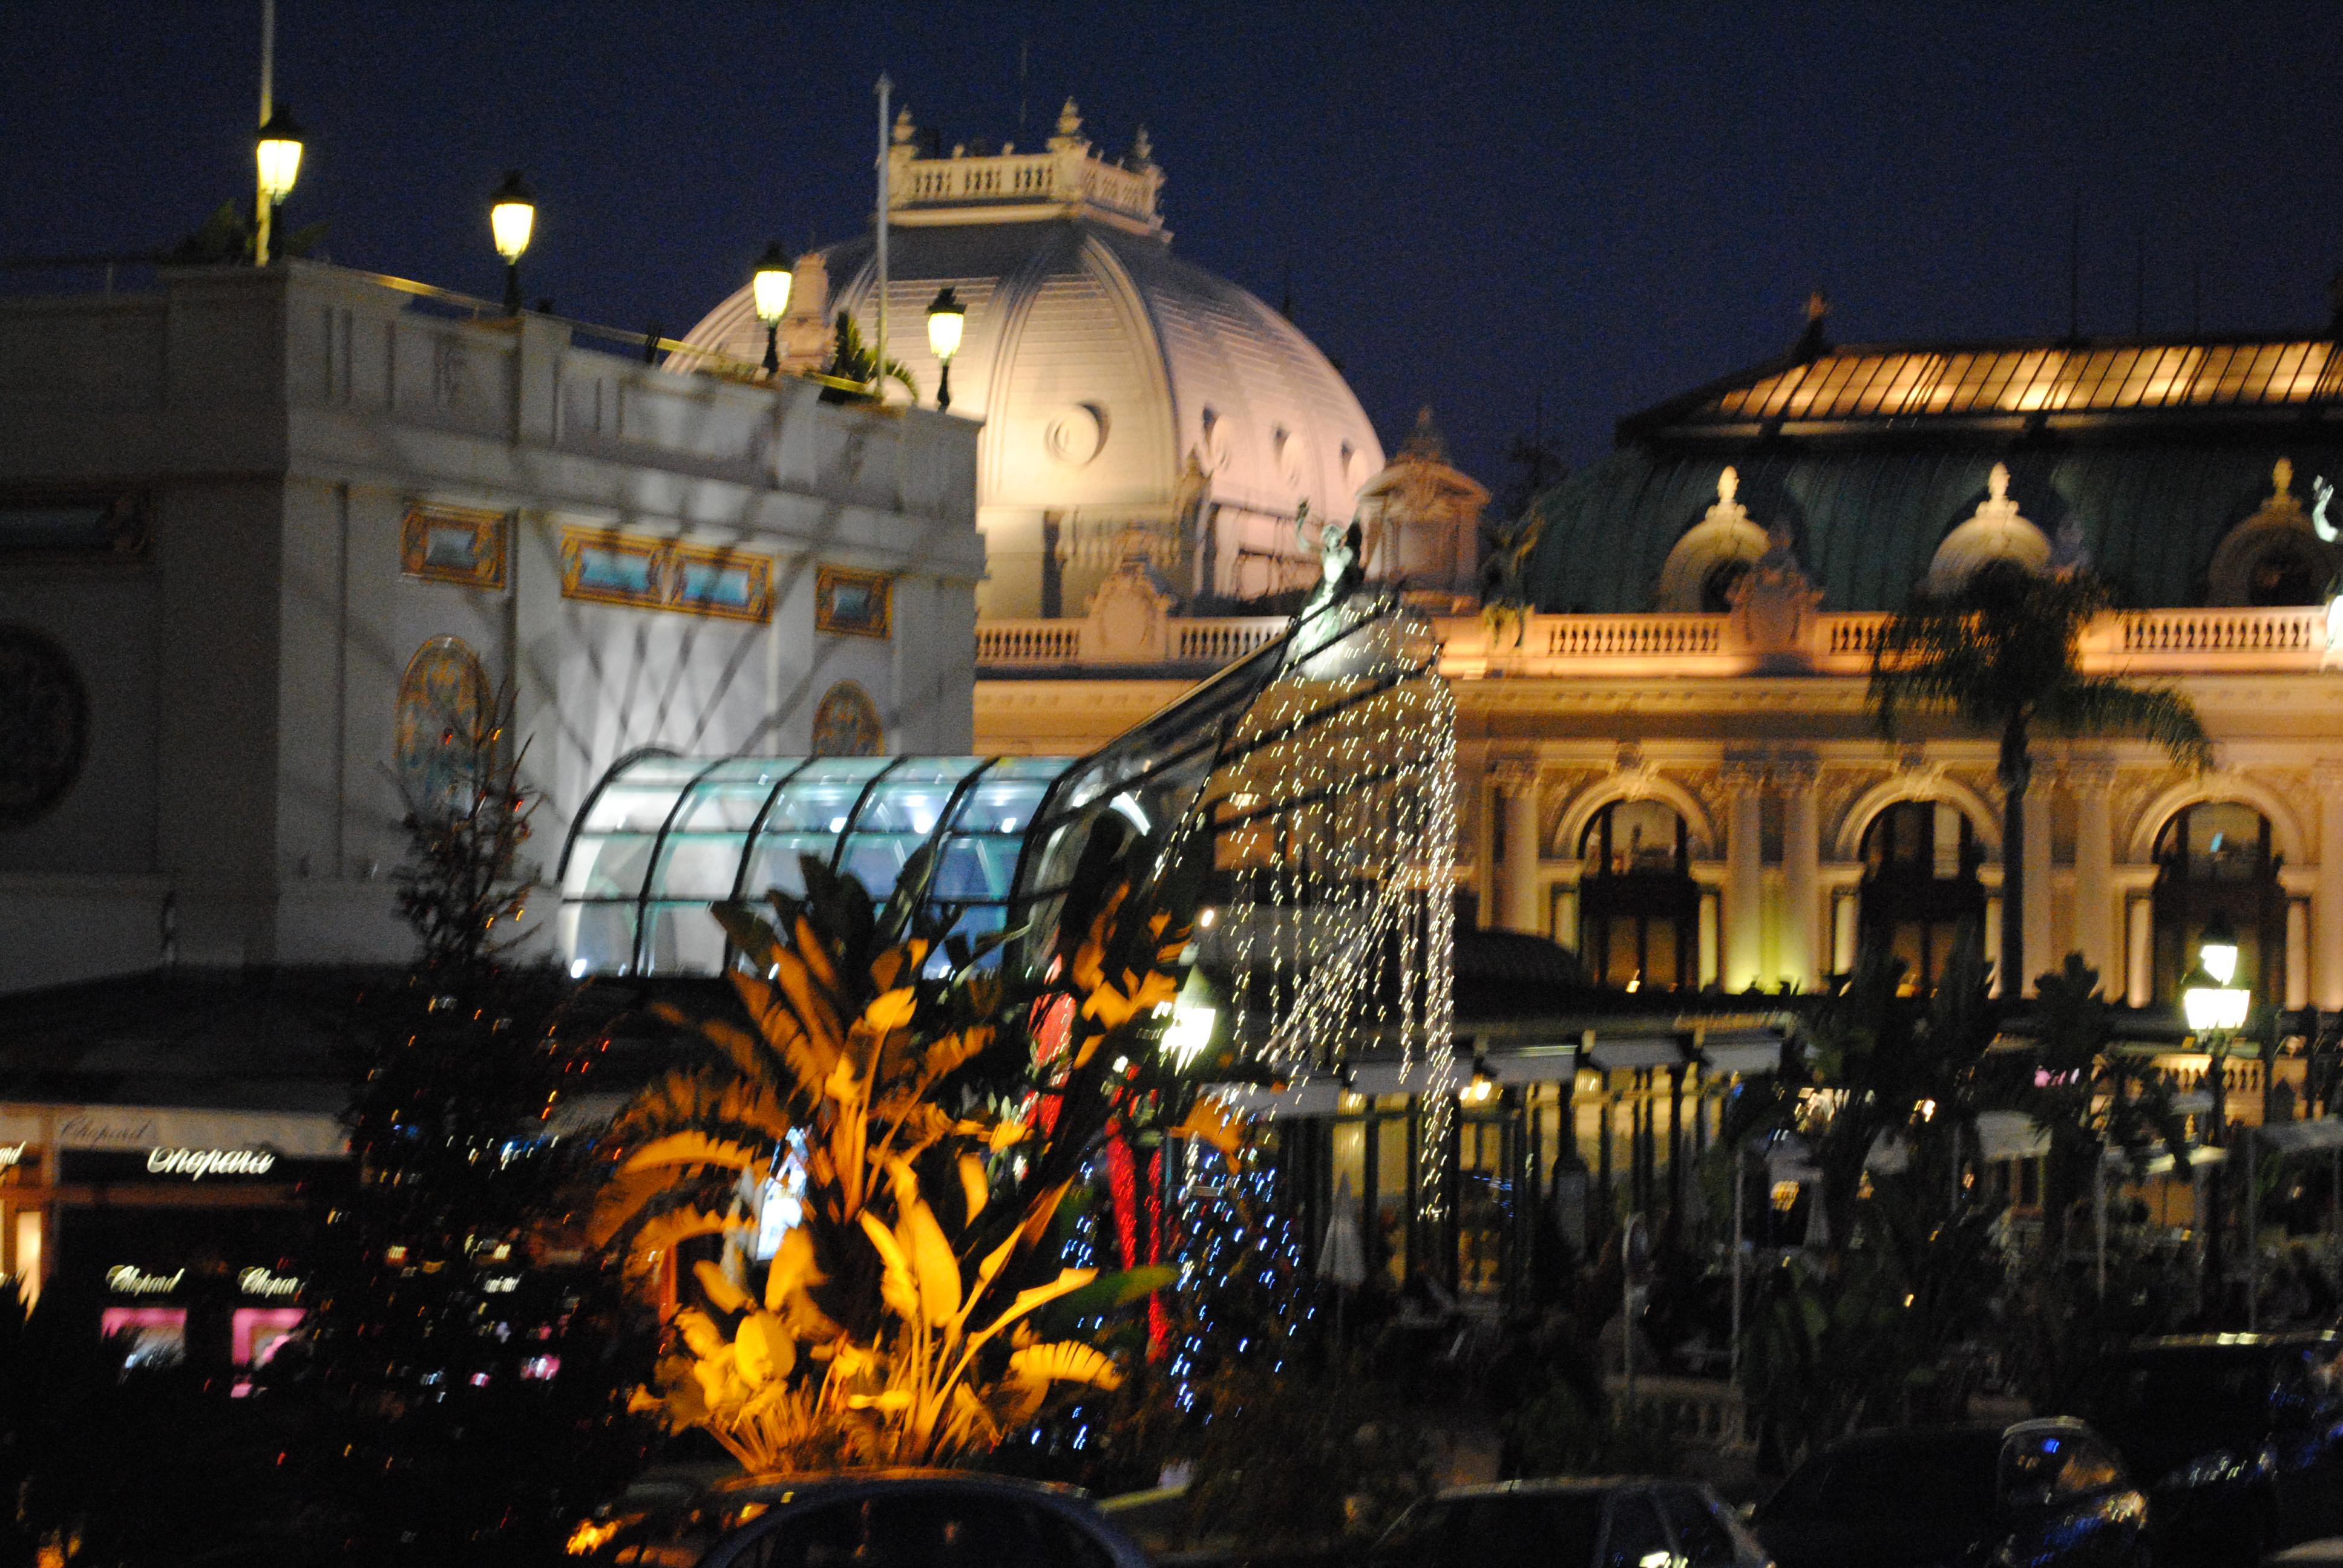 le casino de Monte-Carlo. Les citoyennes sont interdites d'y aller.